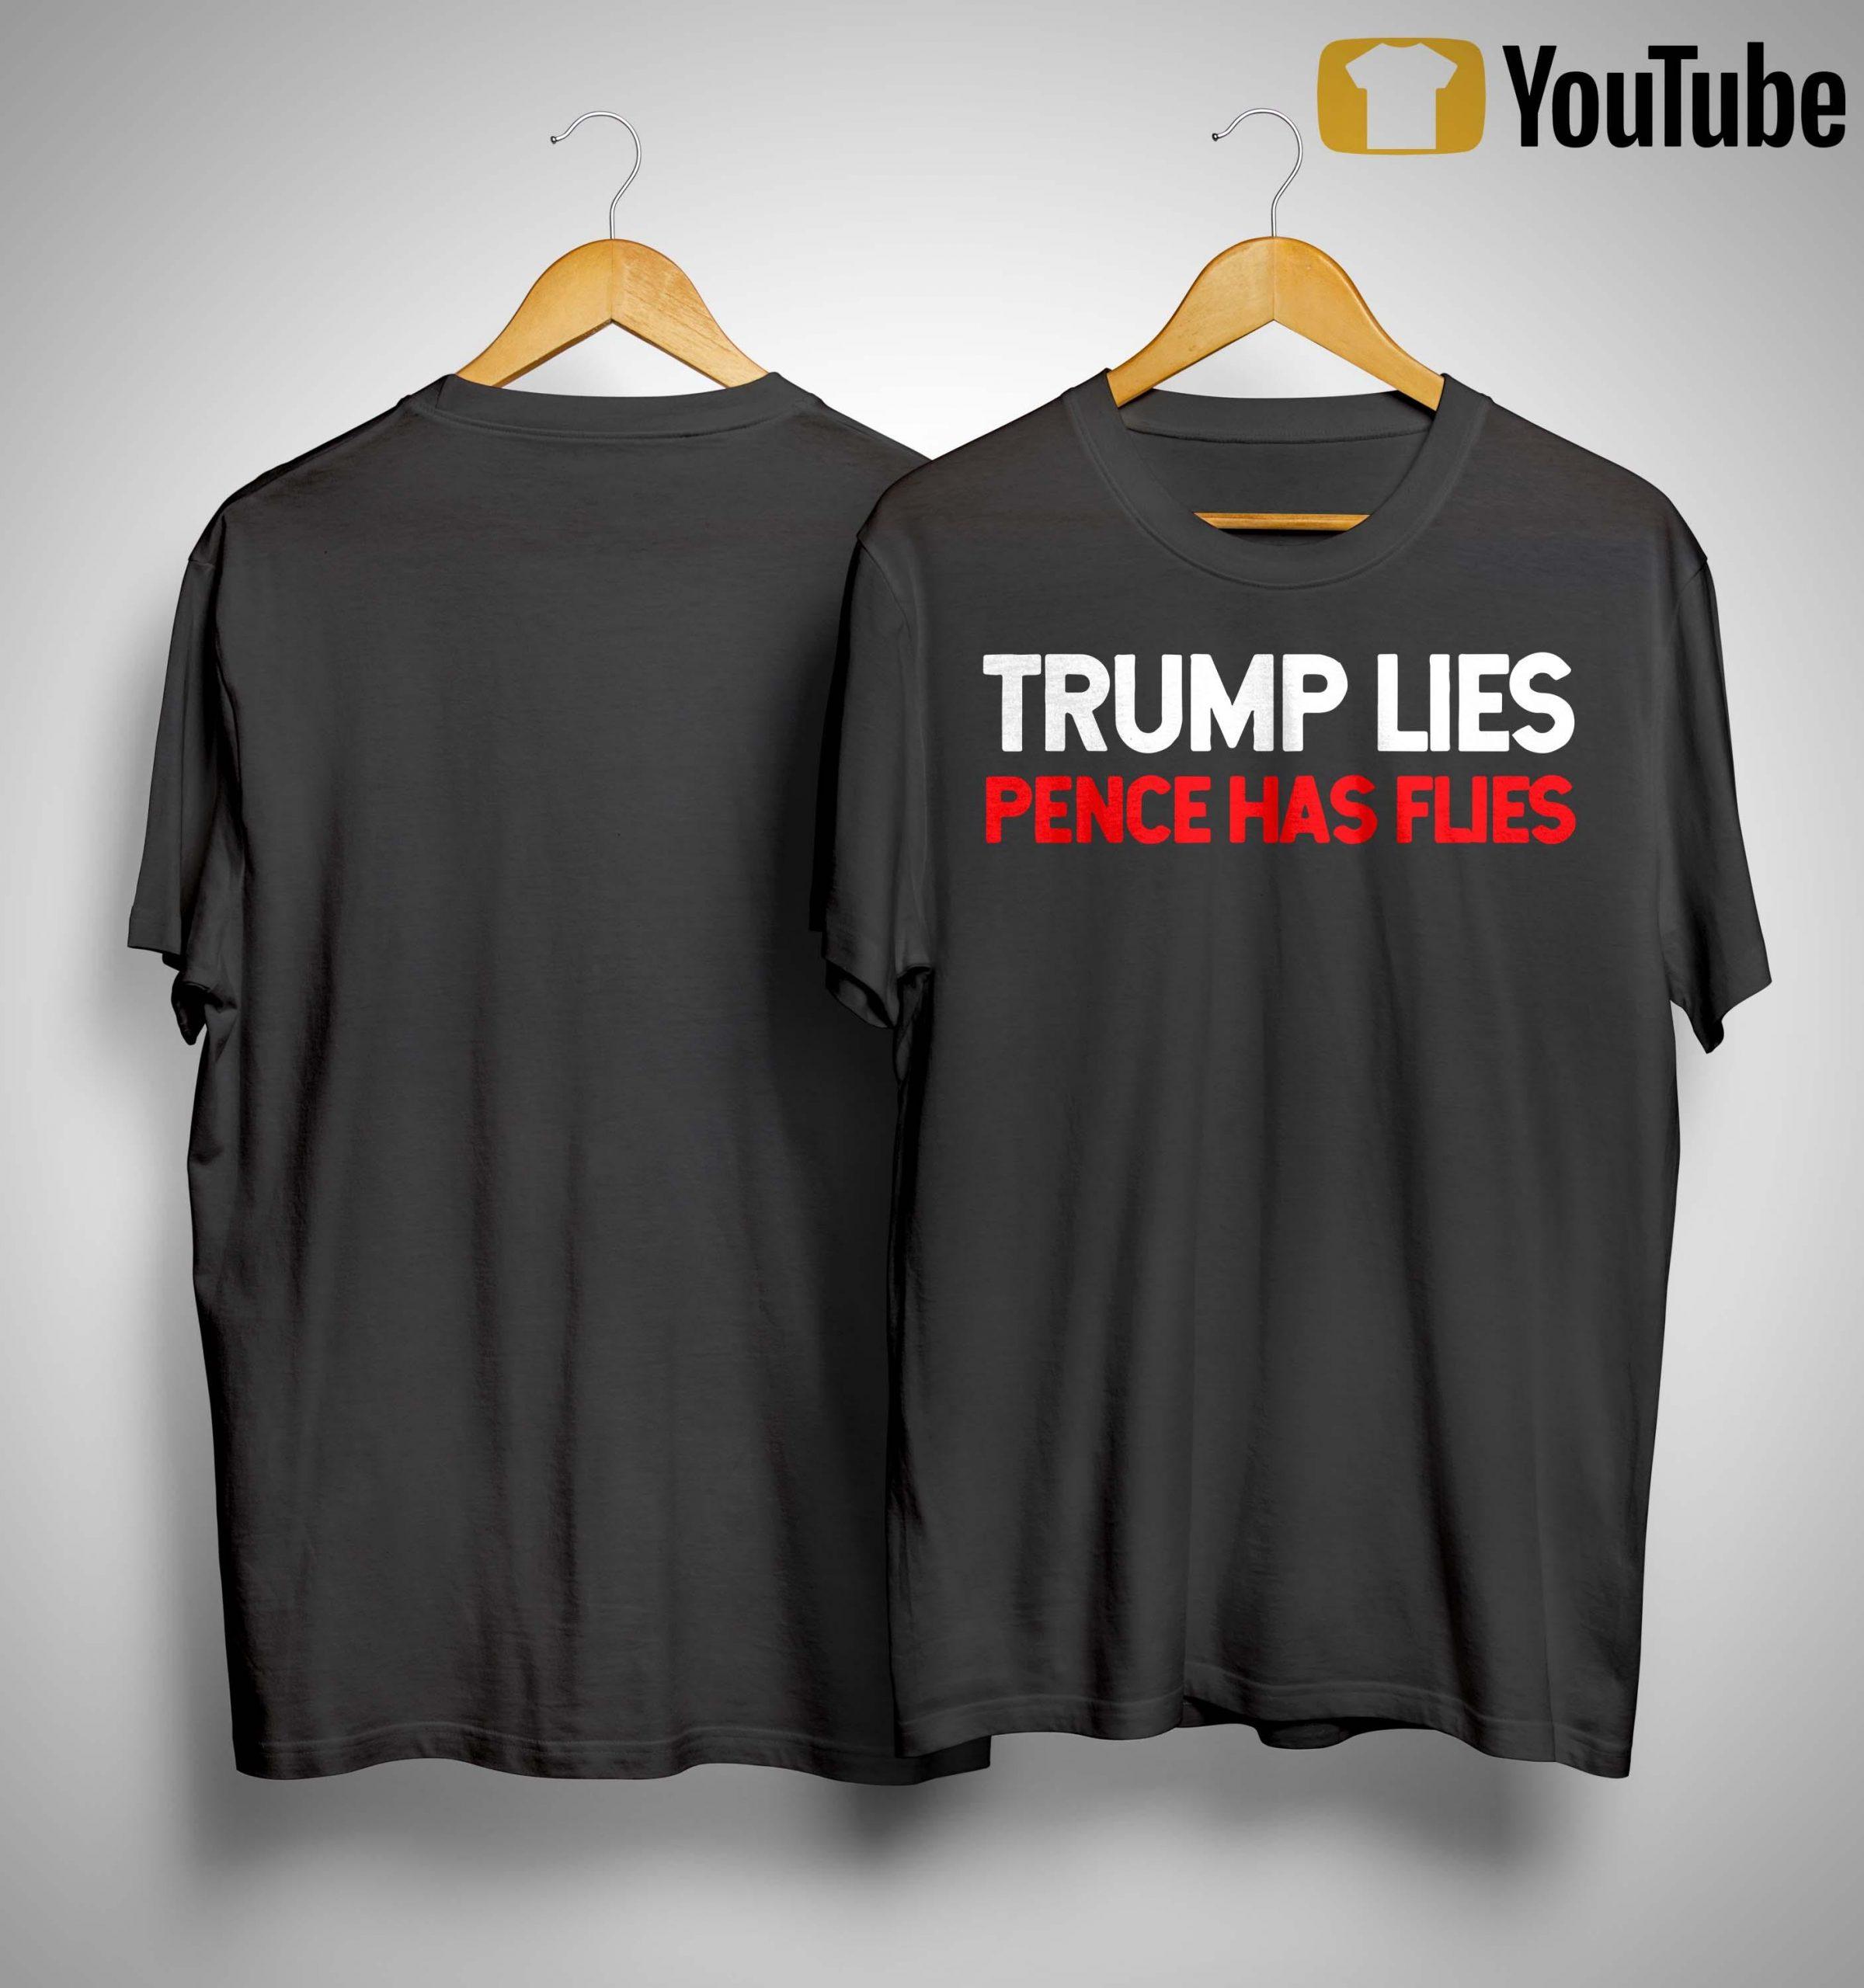 Trump Lies Pence Has Flies Shirt